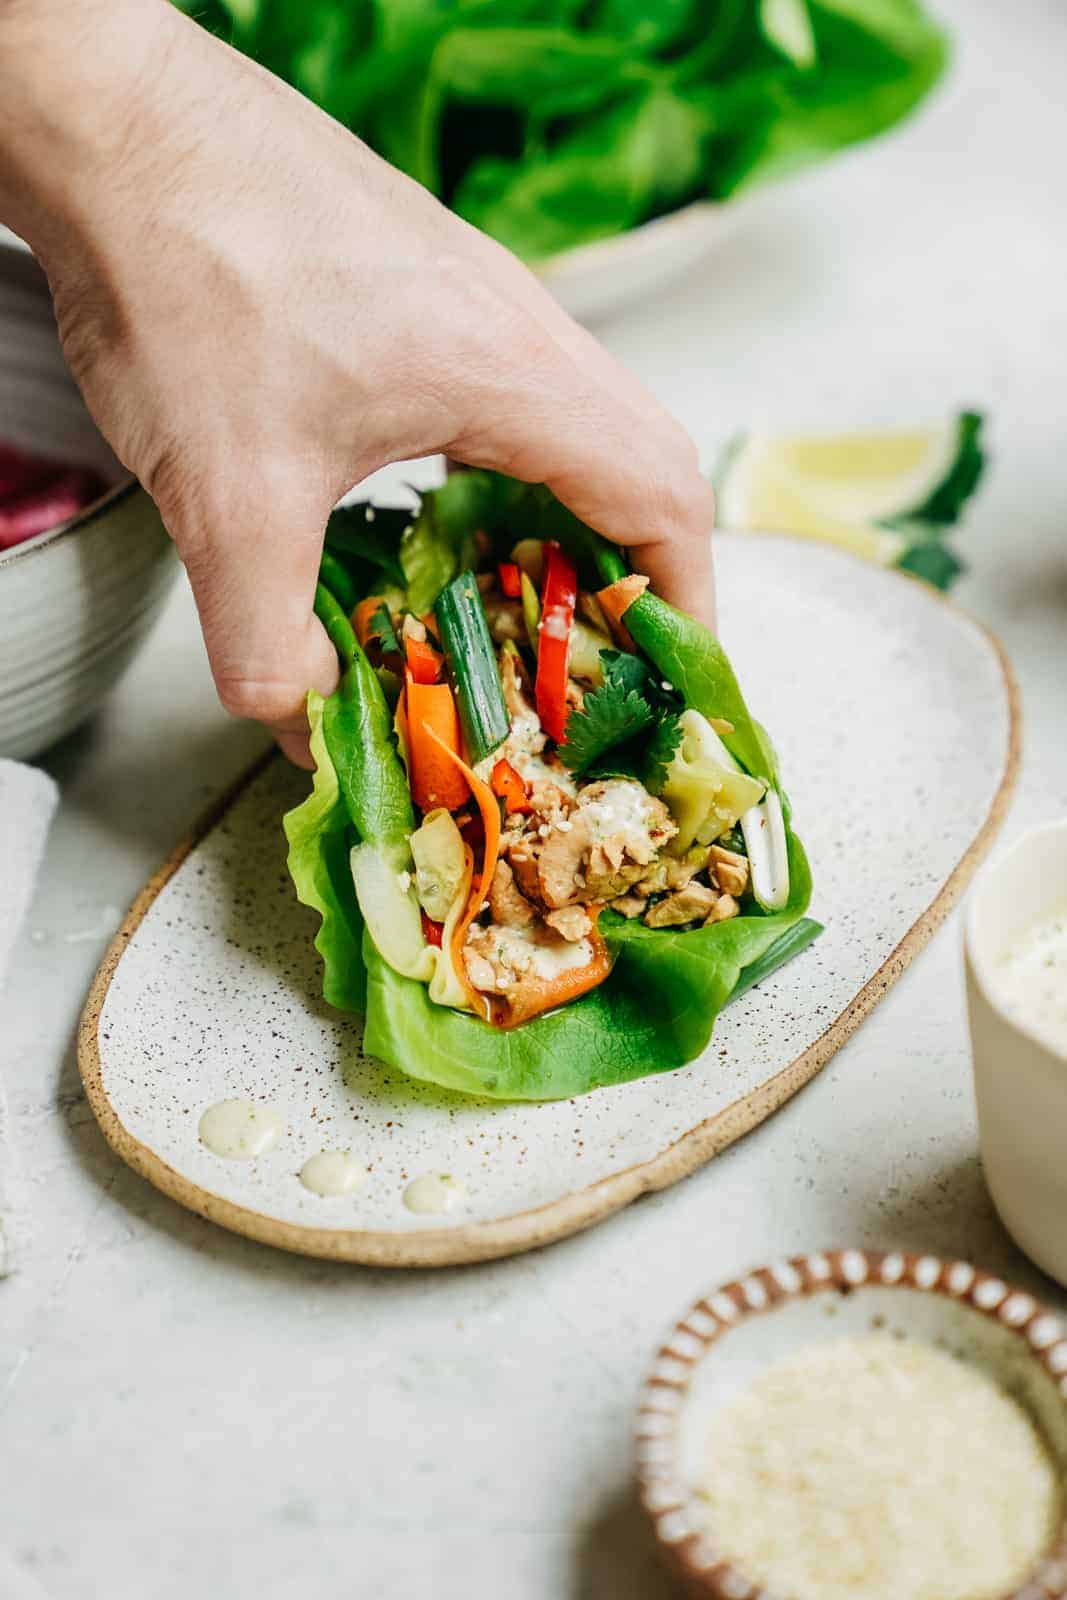 A hand grabbing a vegan tuna lettuce wrap off a plate.